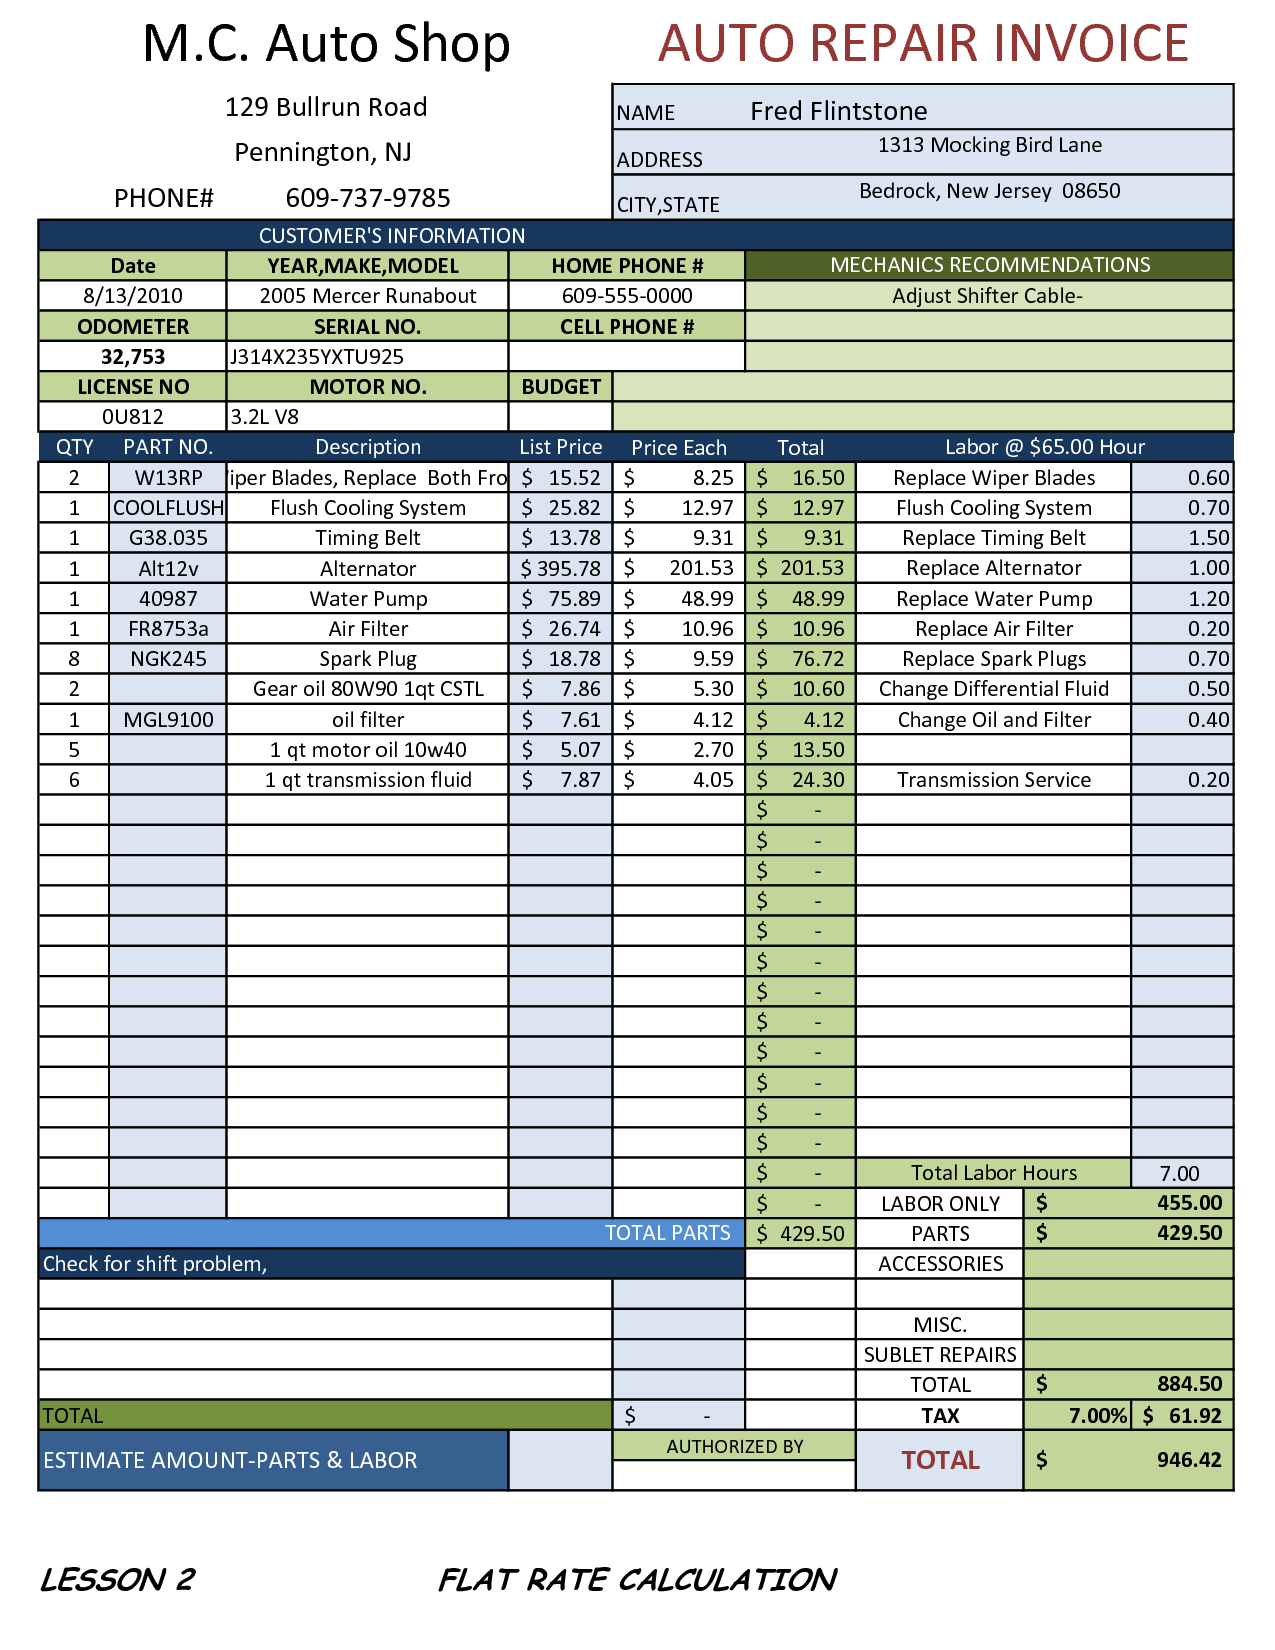 Auto Repair Worksheet Template Printable Worksheets And Activities For Teachers Parents Tutors And Homeschool Families